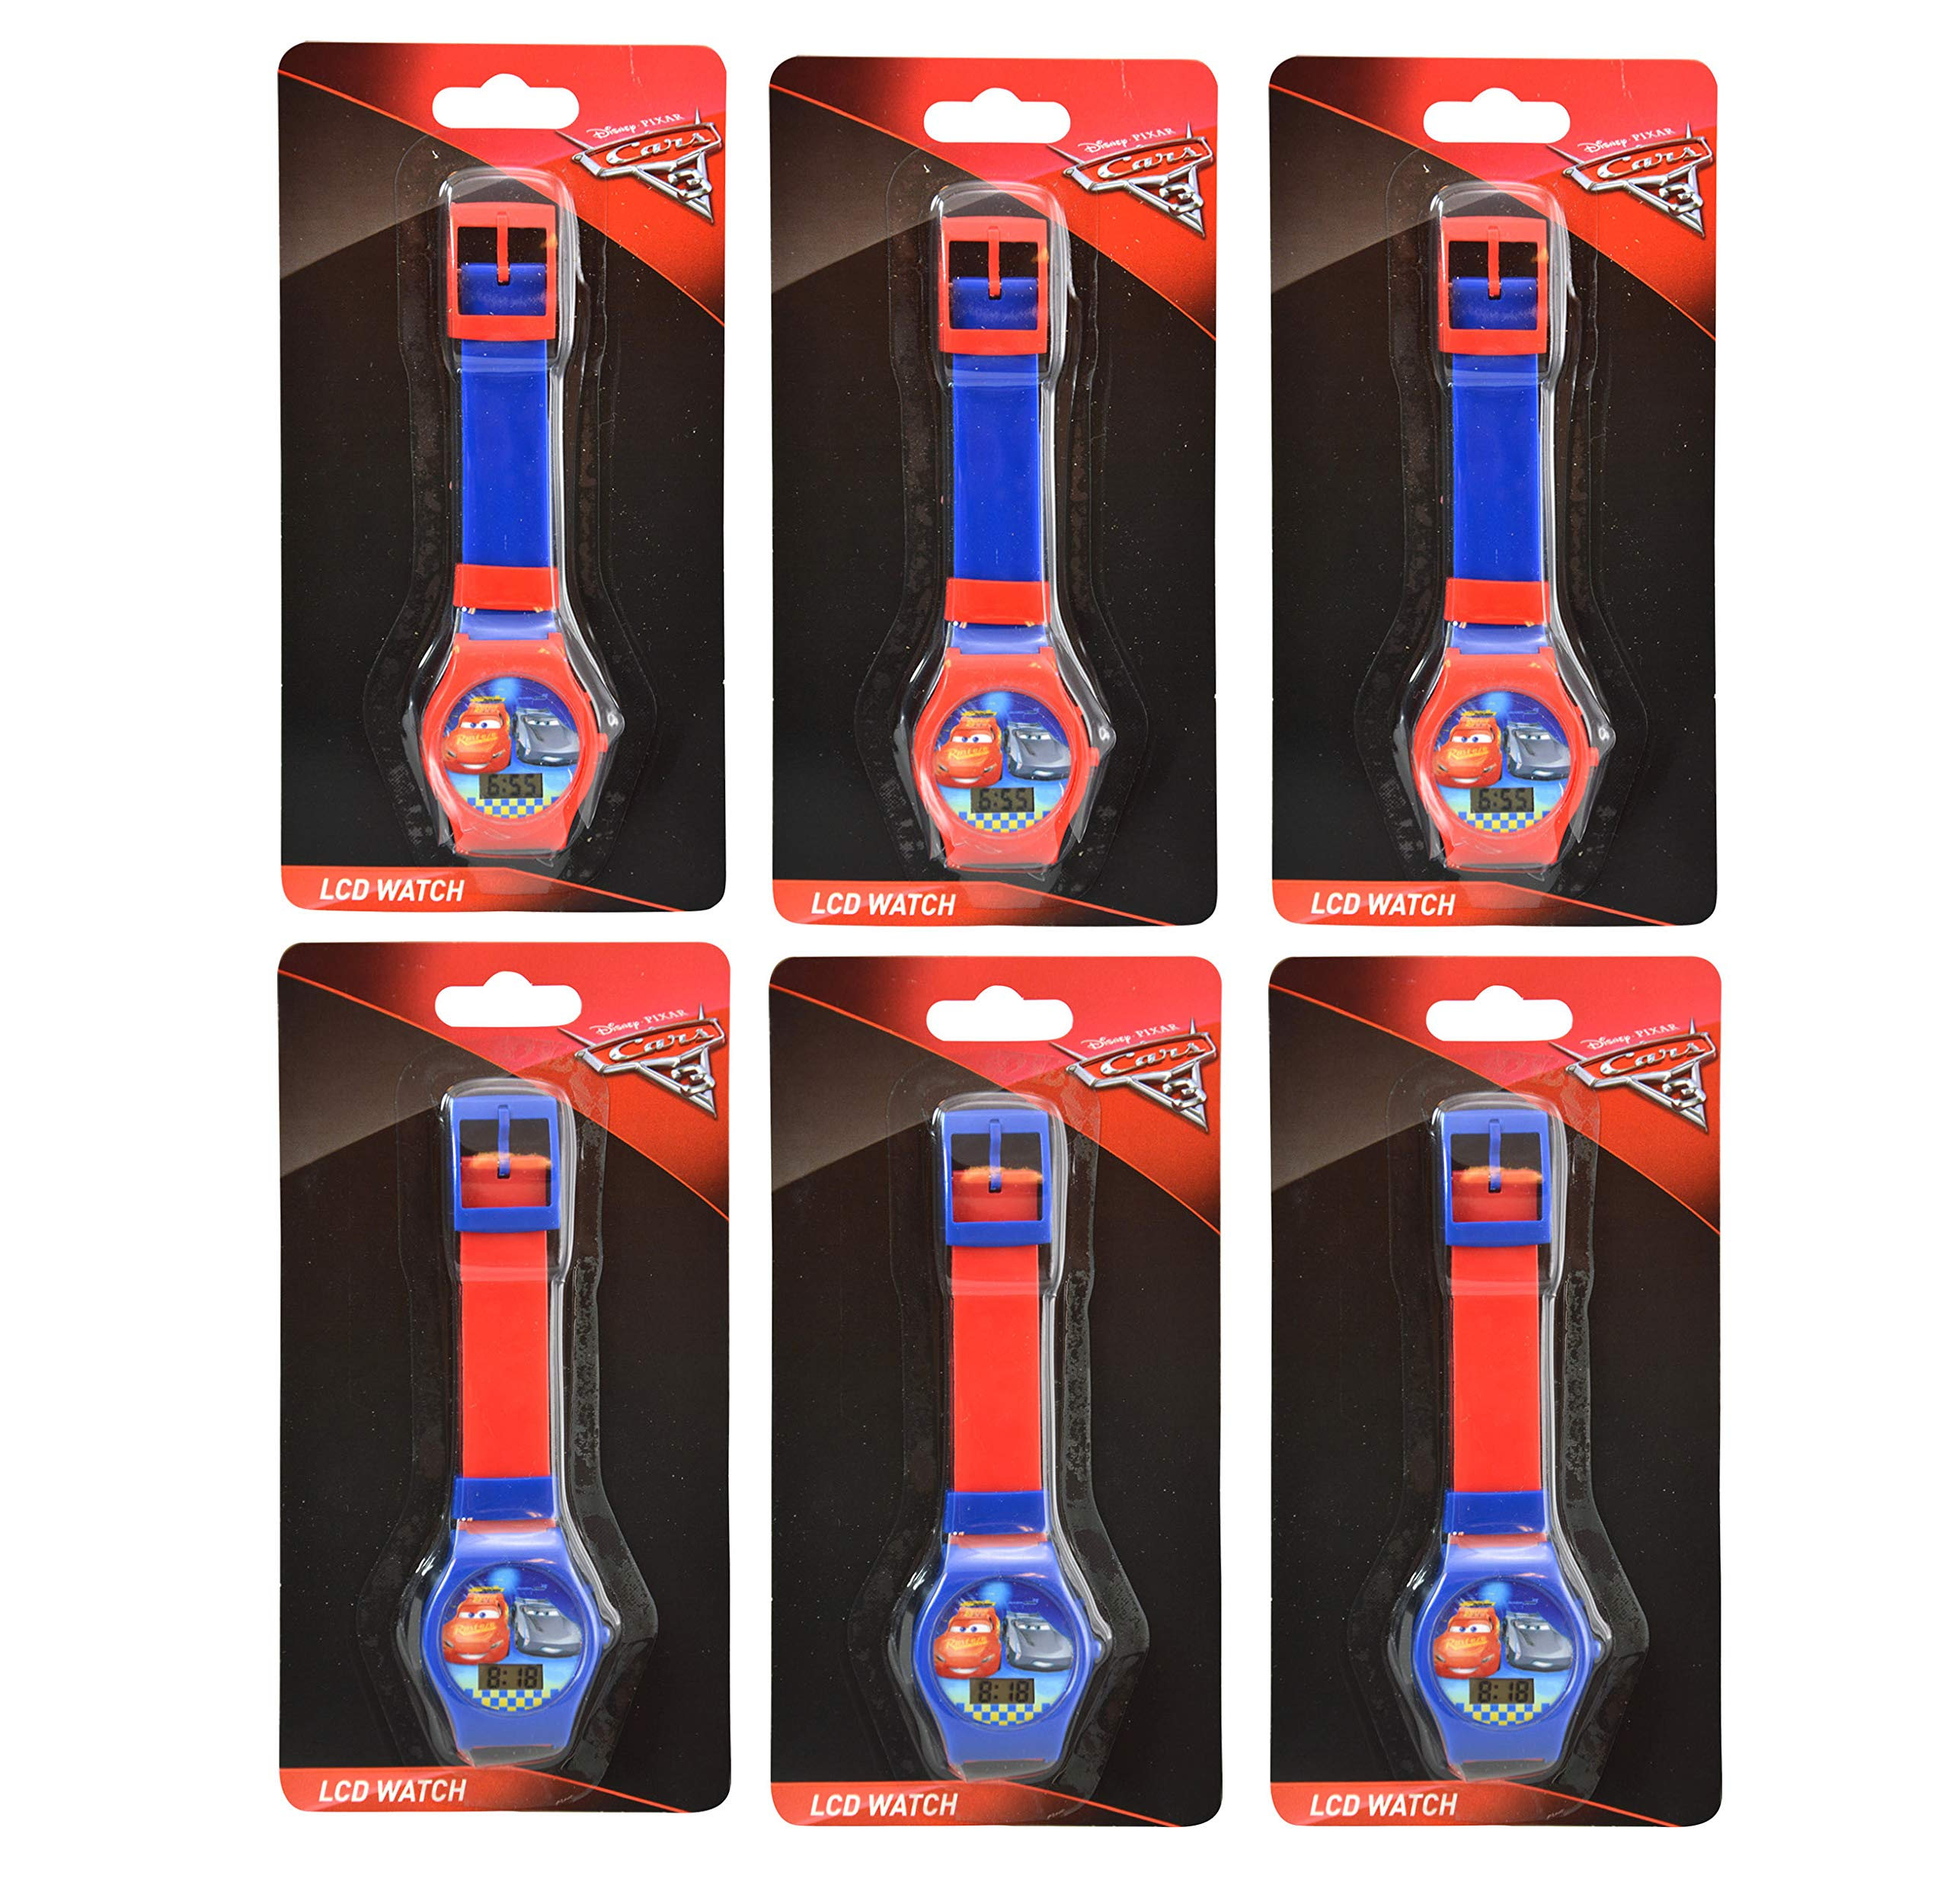 Karacter Box Disney Cars 3 LCD Digital Watch, 6-Pack Party Favors